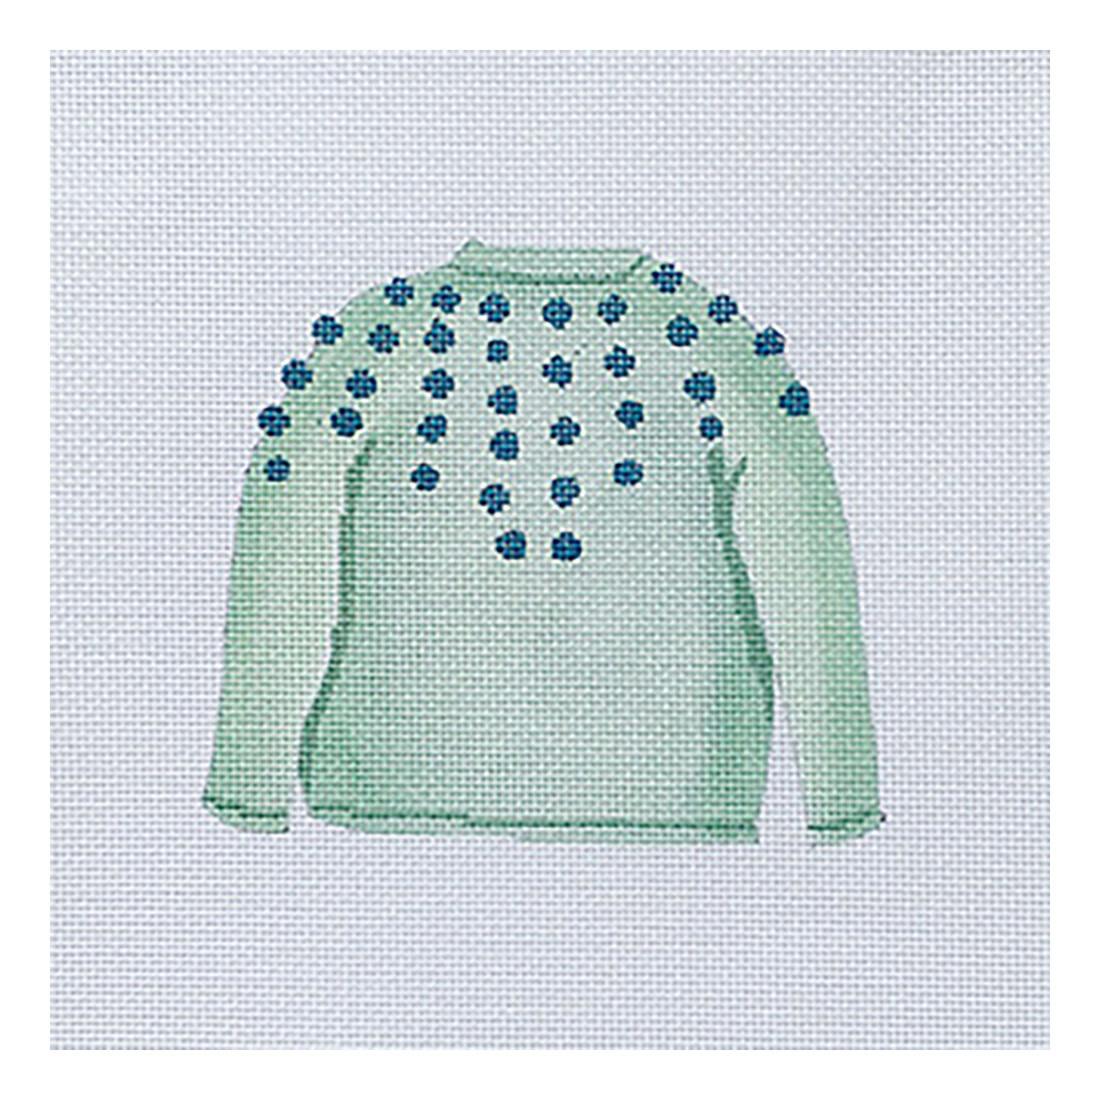 All About Stitching Sara Fitz Needlepoint Kit - Mint Pom Sweater